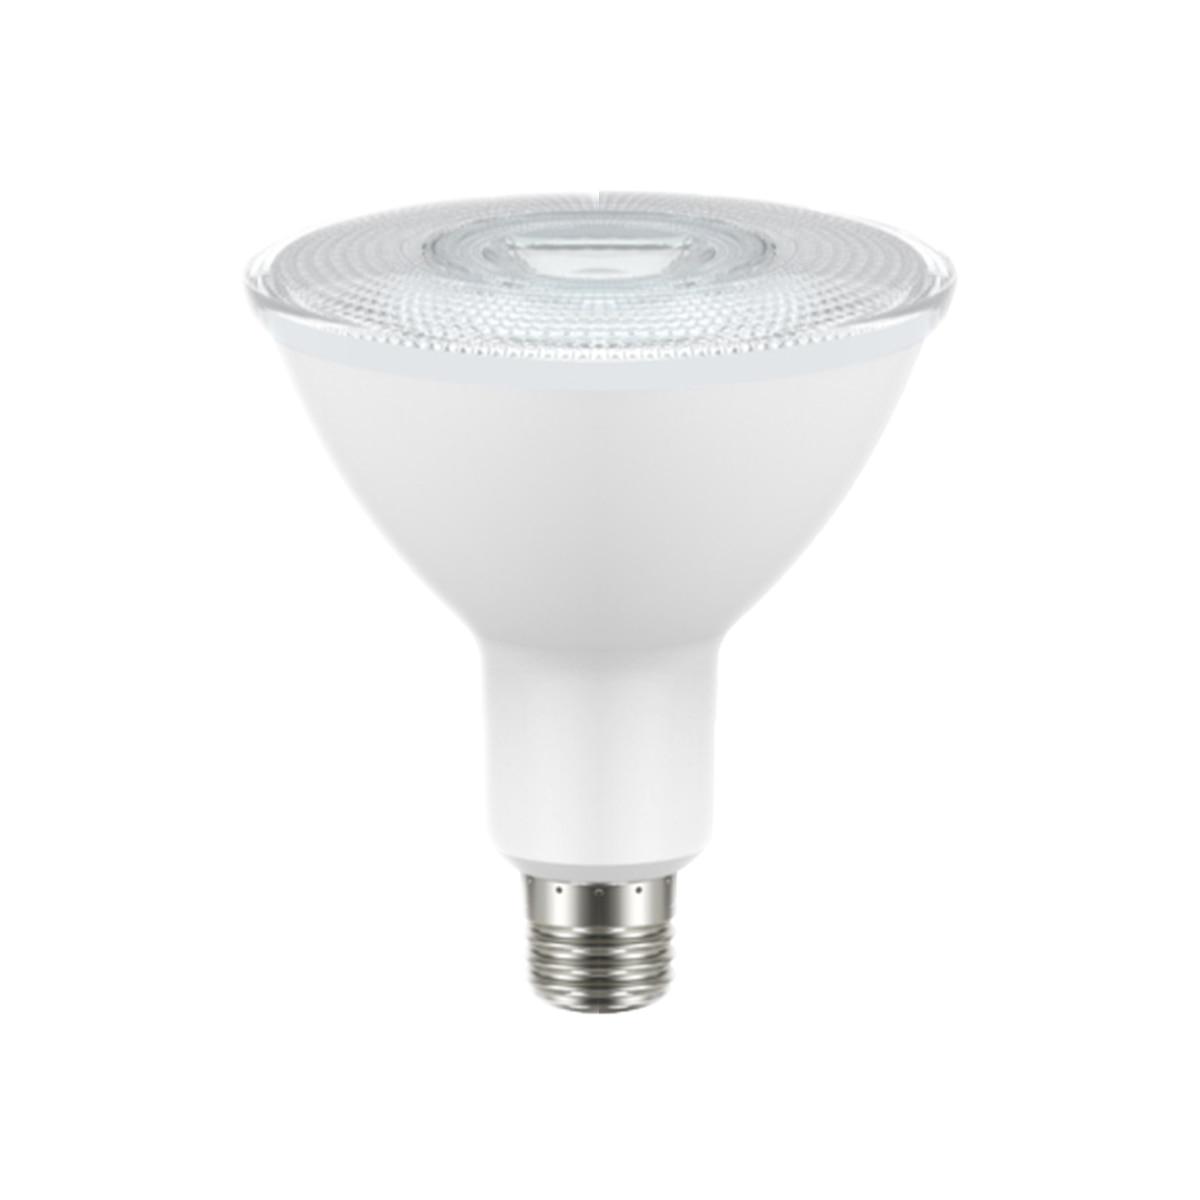 naturaled 13 watt led par38 lamp